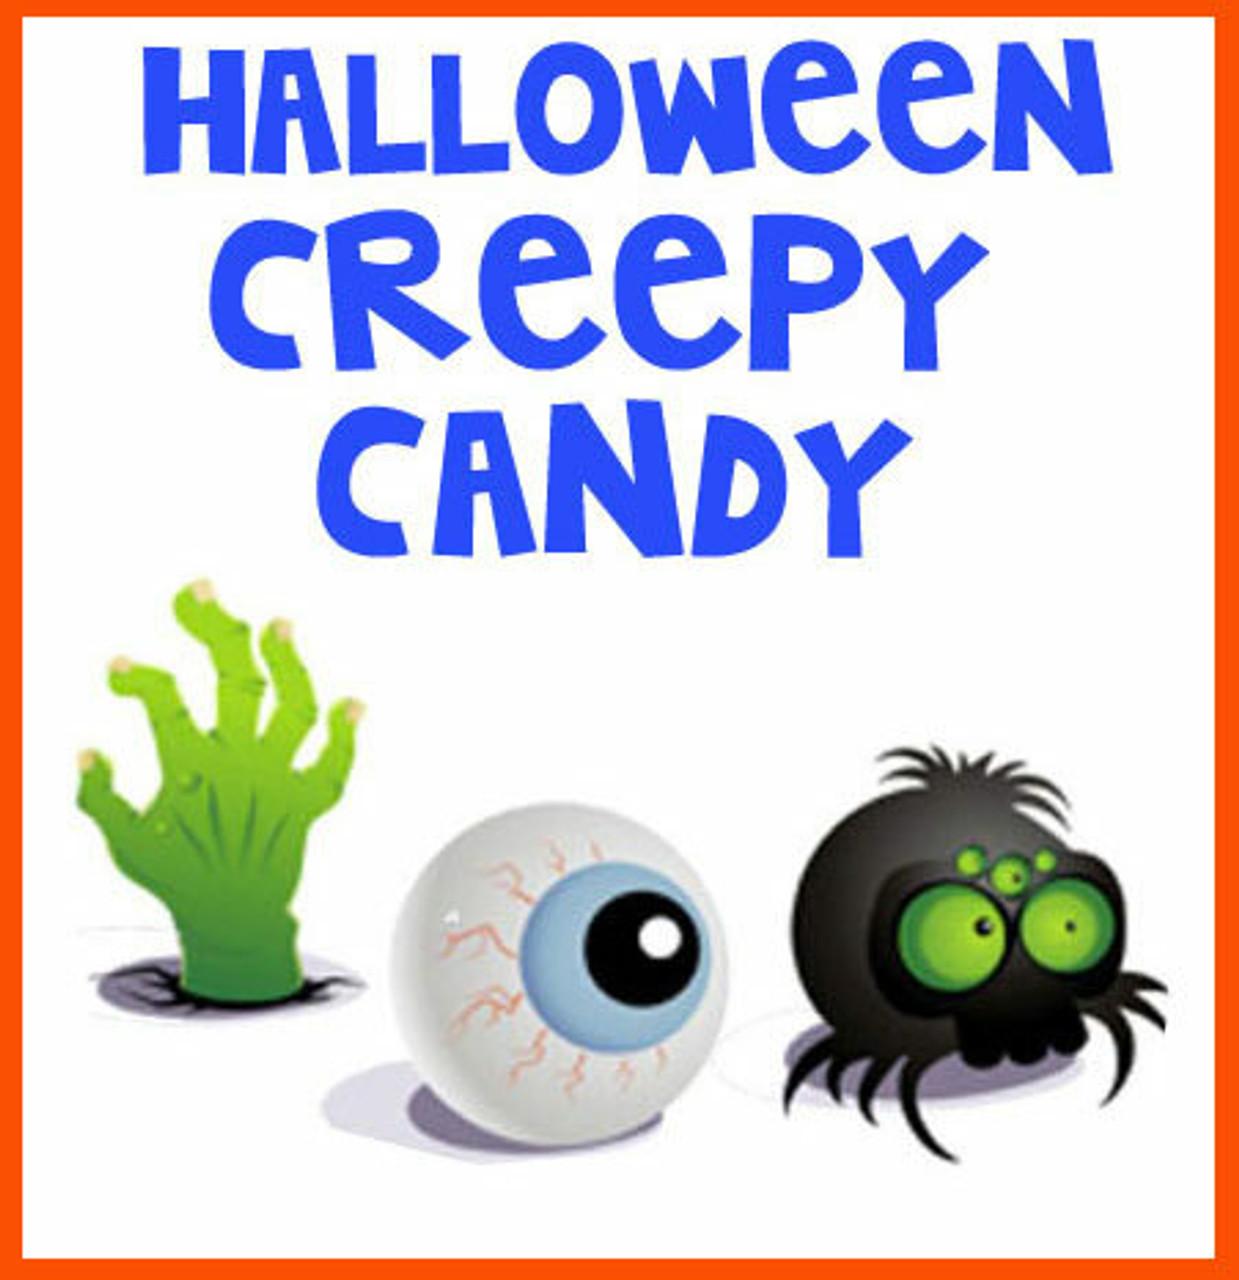 Creepy Scary Halloween Candy